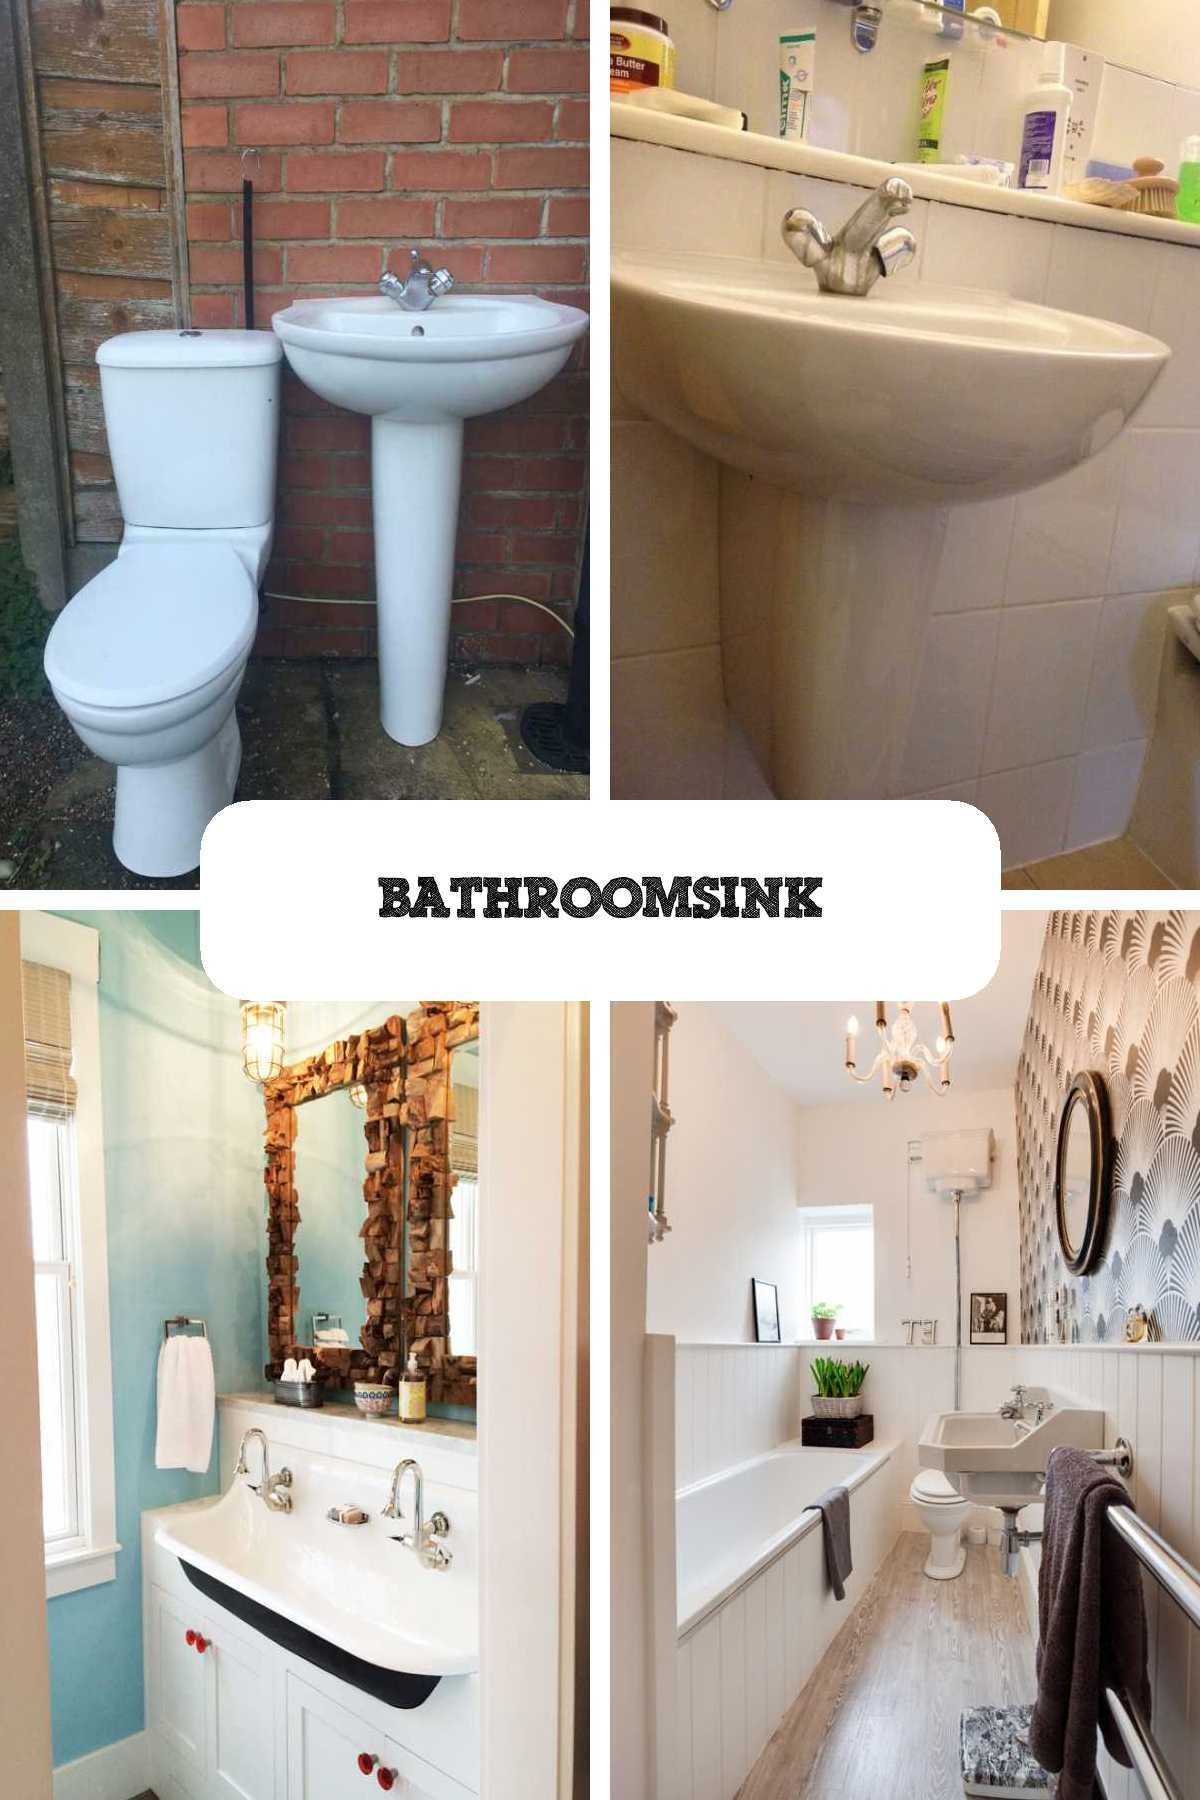 Photo of bathroomsink